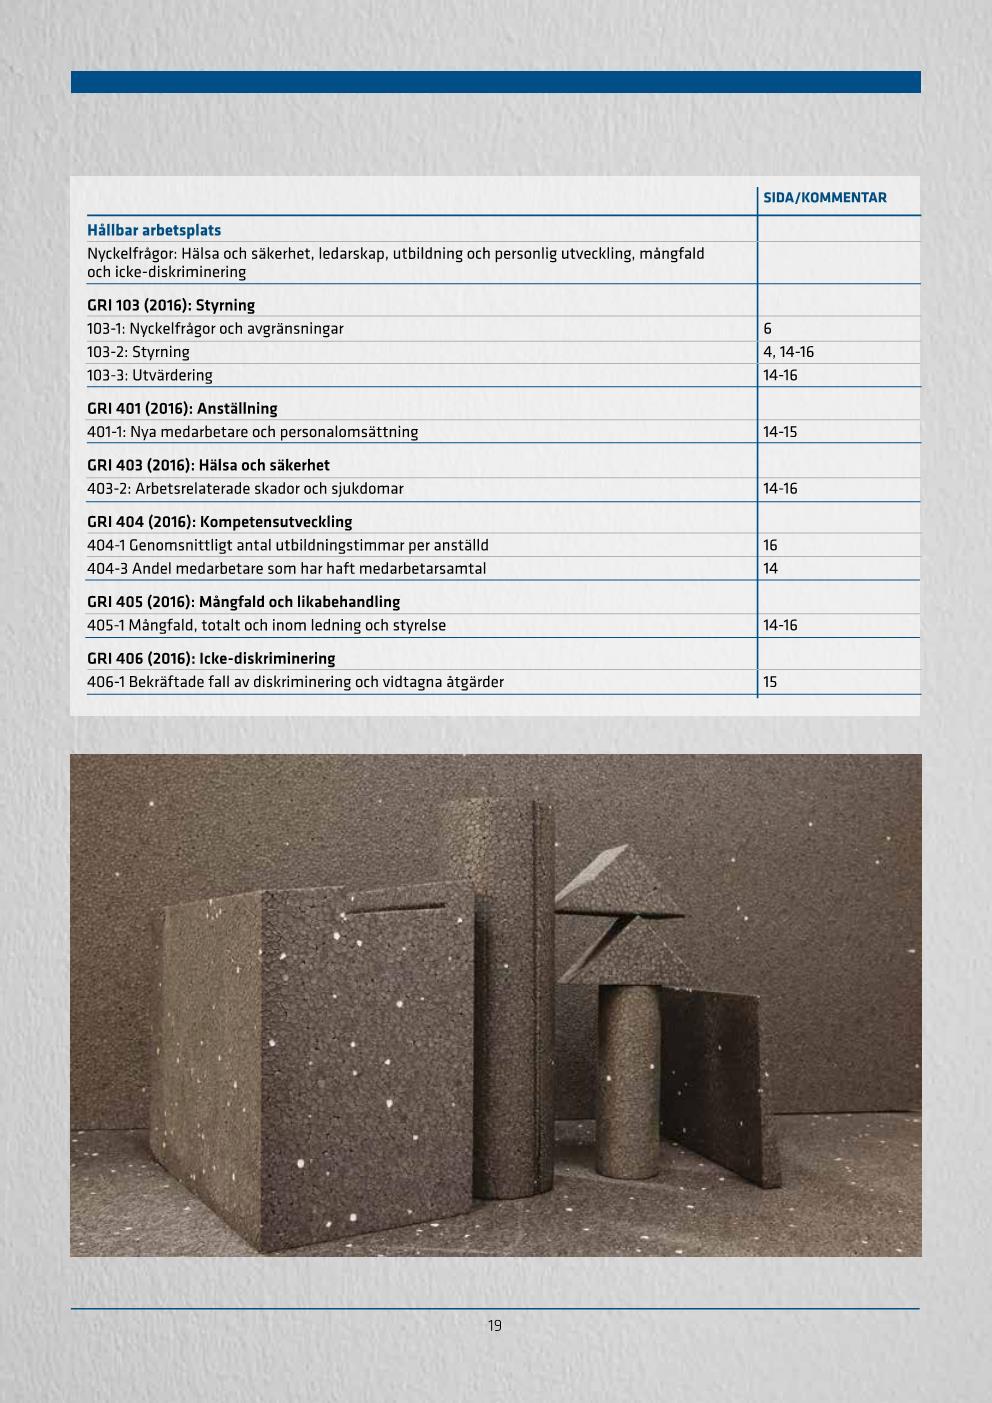 UBAB Hållbarhetsredovisning 2018_webres Sida 019